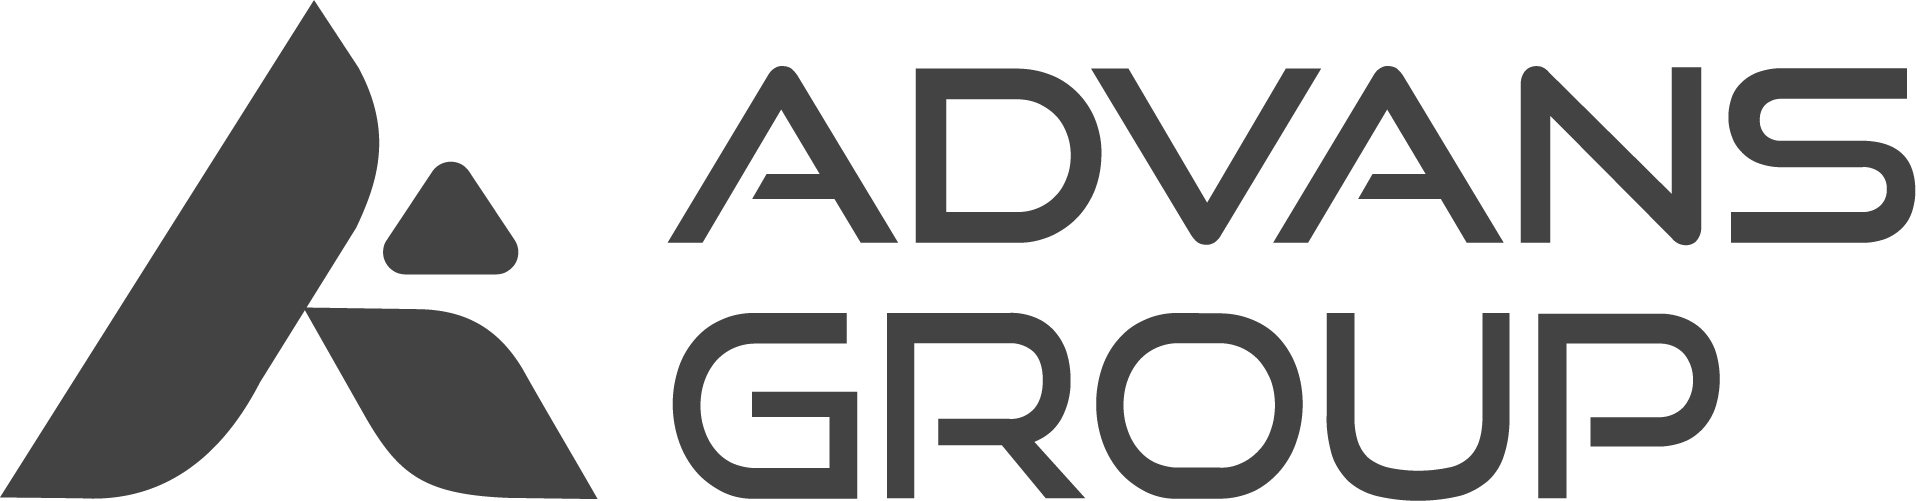 ag-logo-color